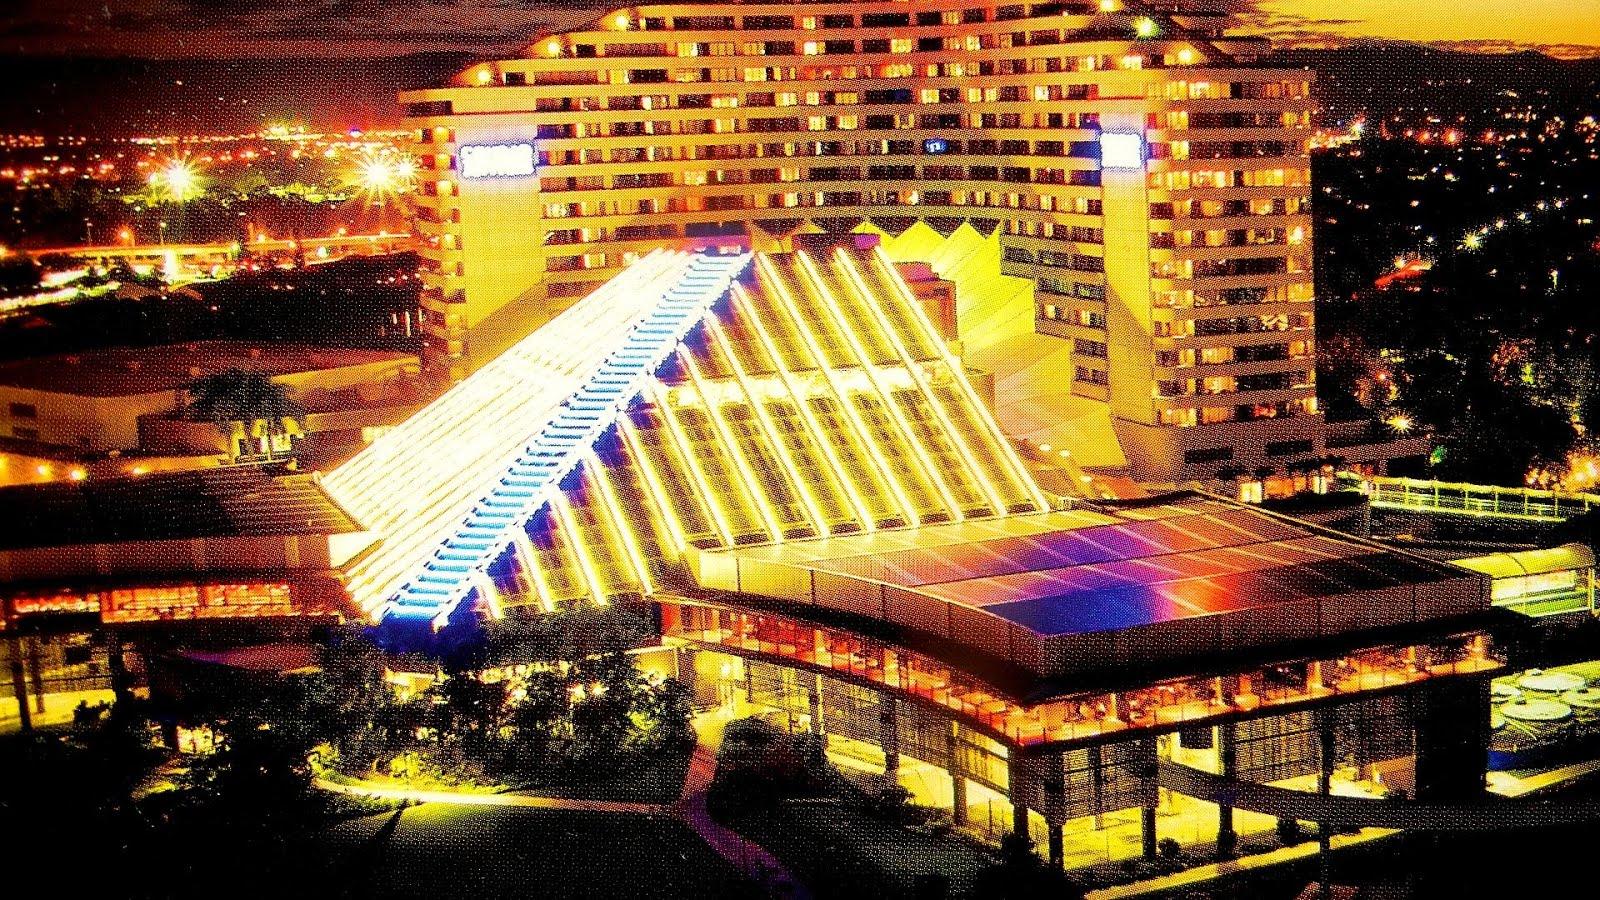 Jupiters Hotel And Casino Gold Coast